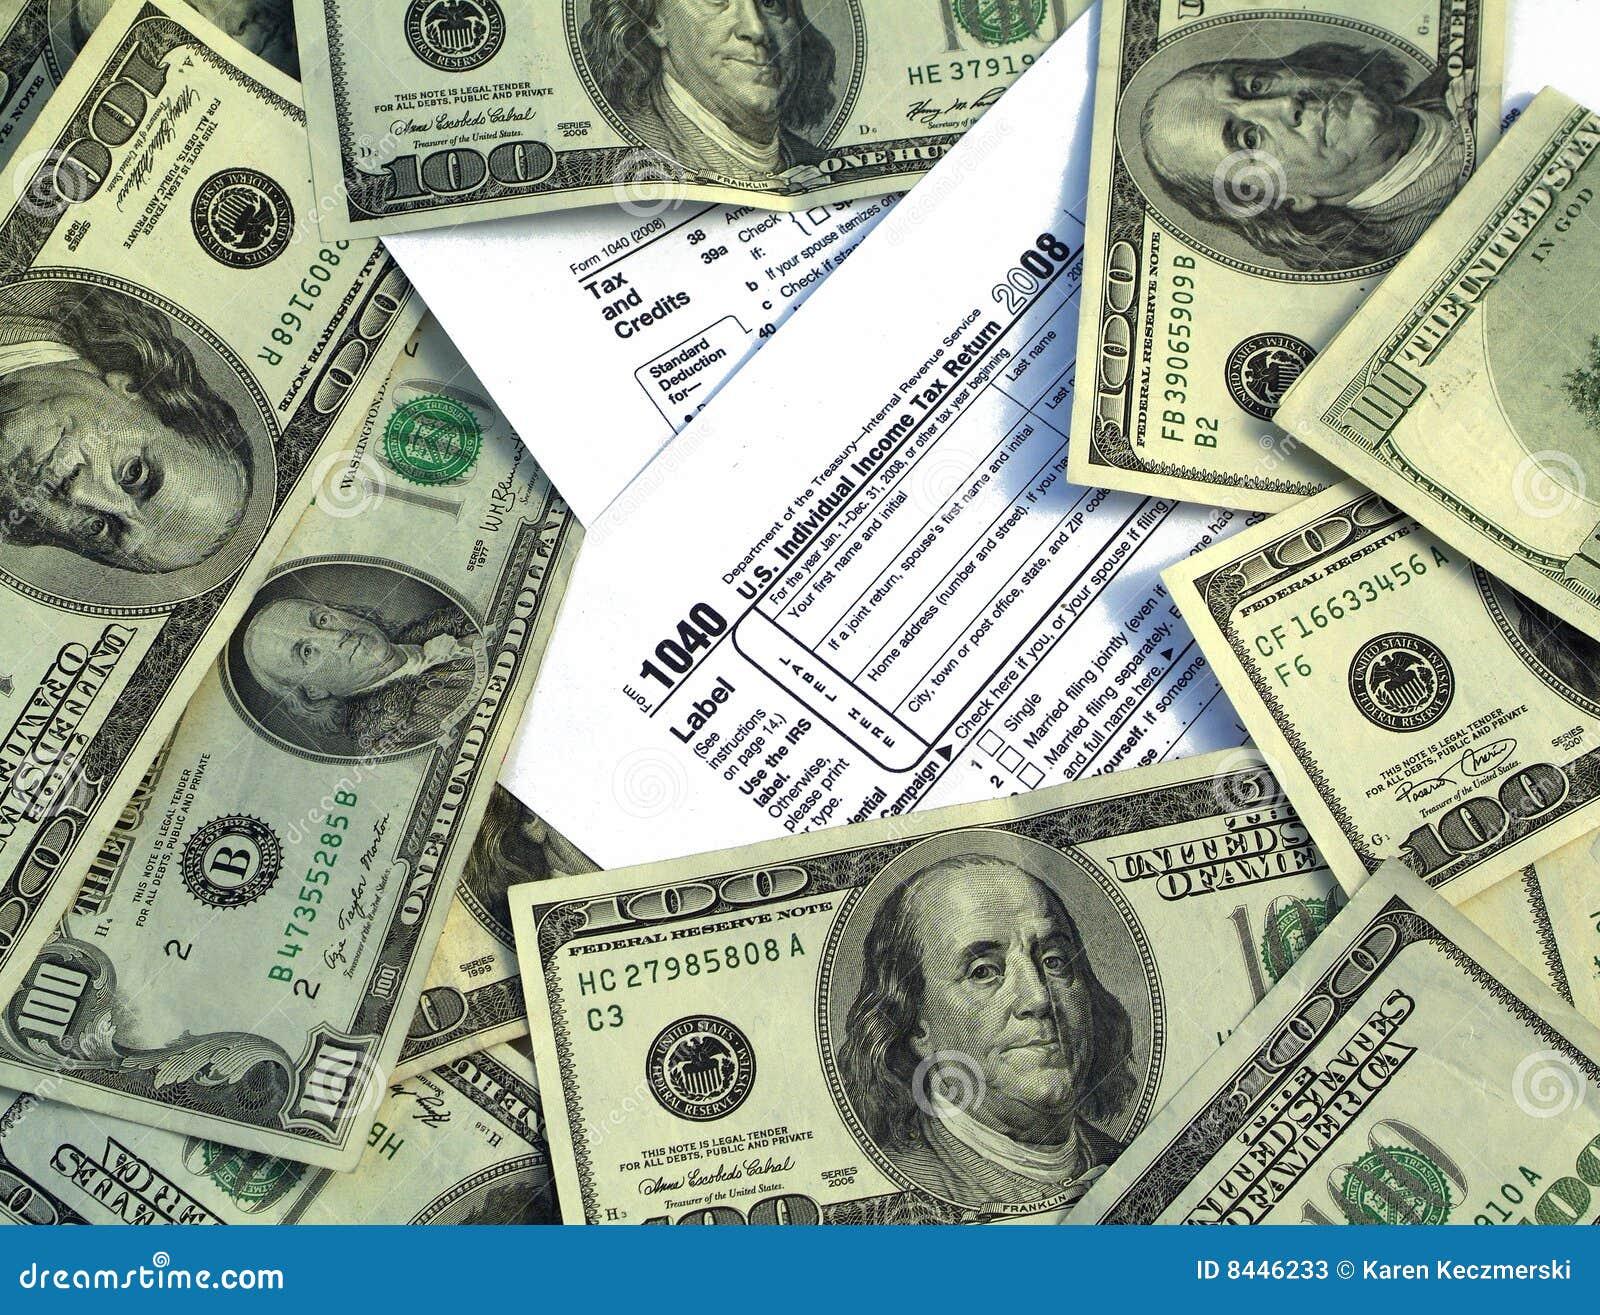 Million Dollar Bills and other fun bills